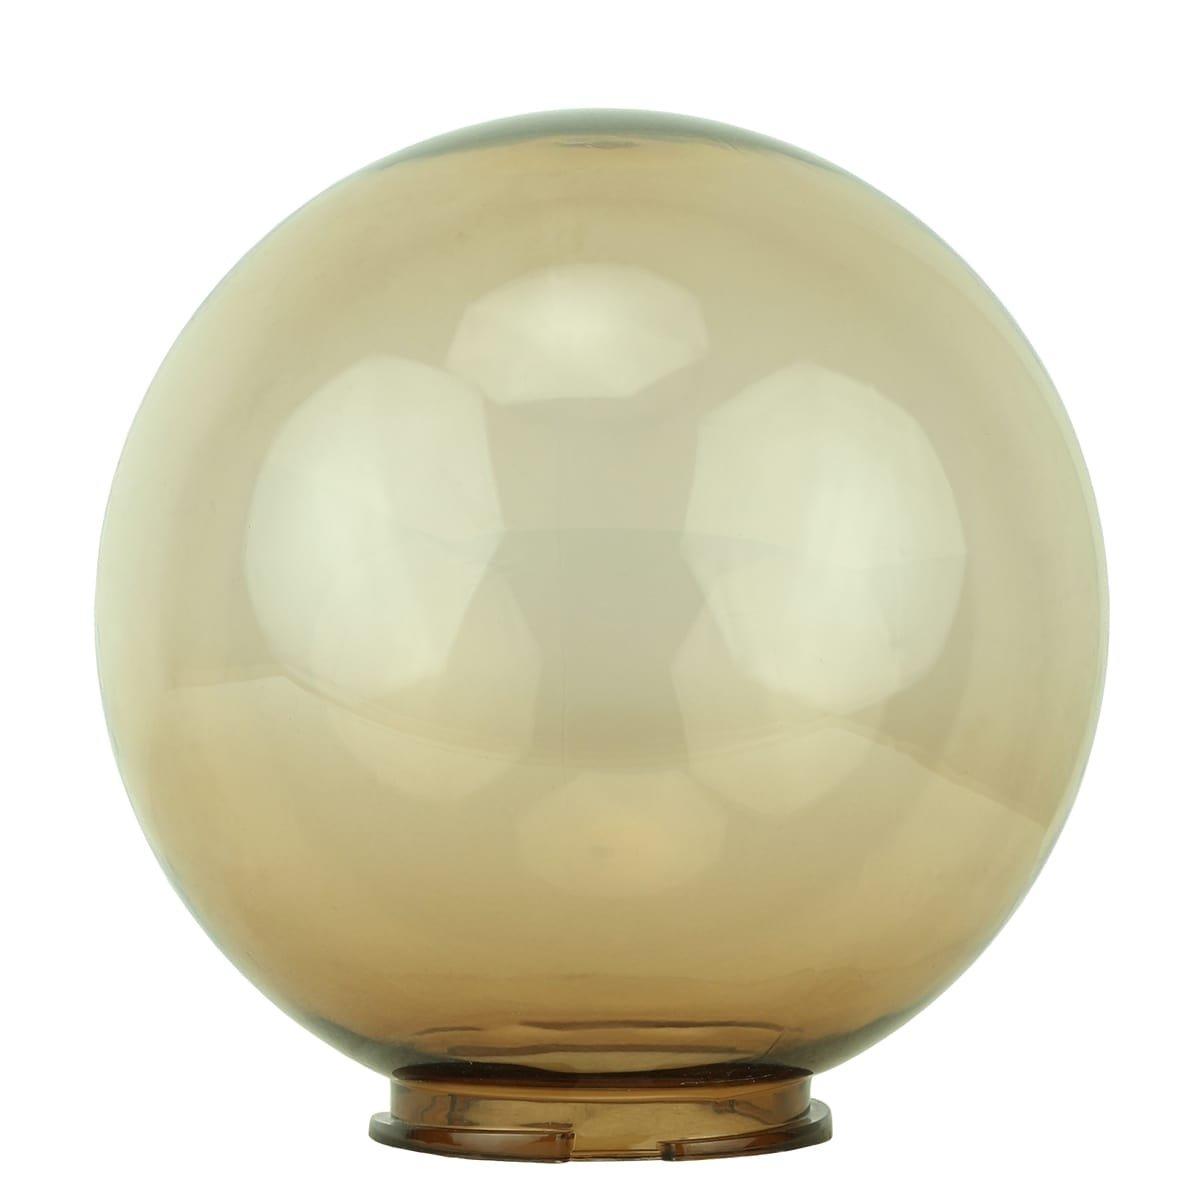 Buitenverlichting Onderdelen Losse bol lamp plastic rookglas - Ø 40 cm